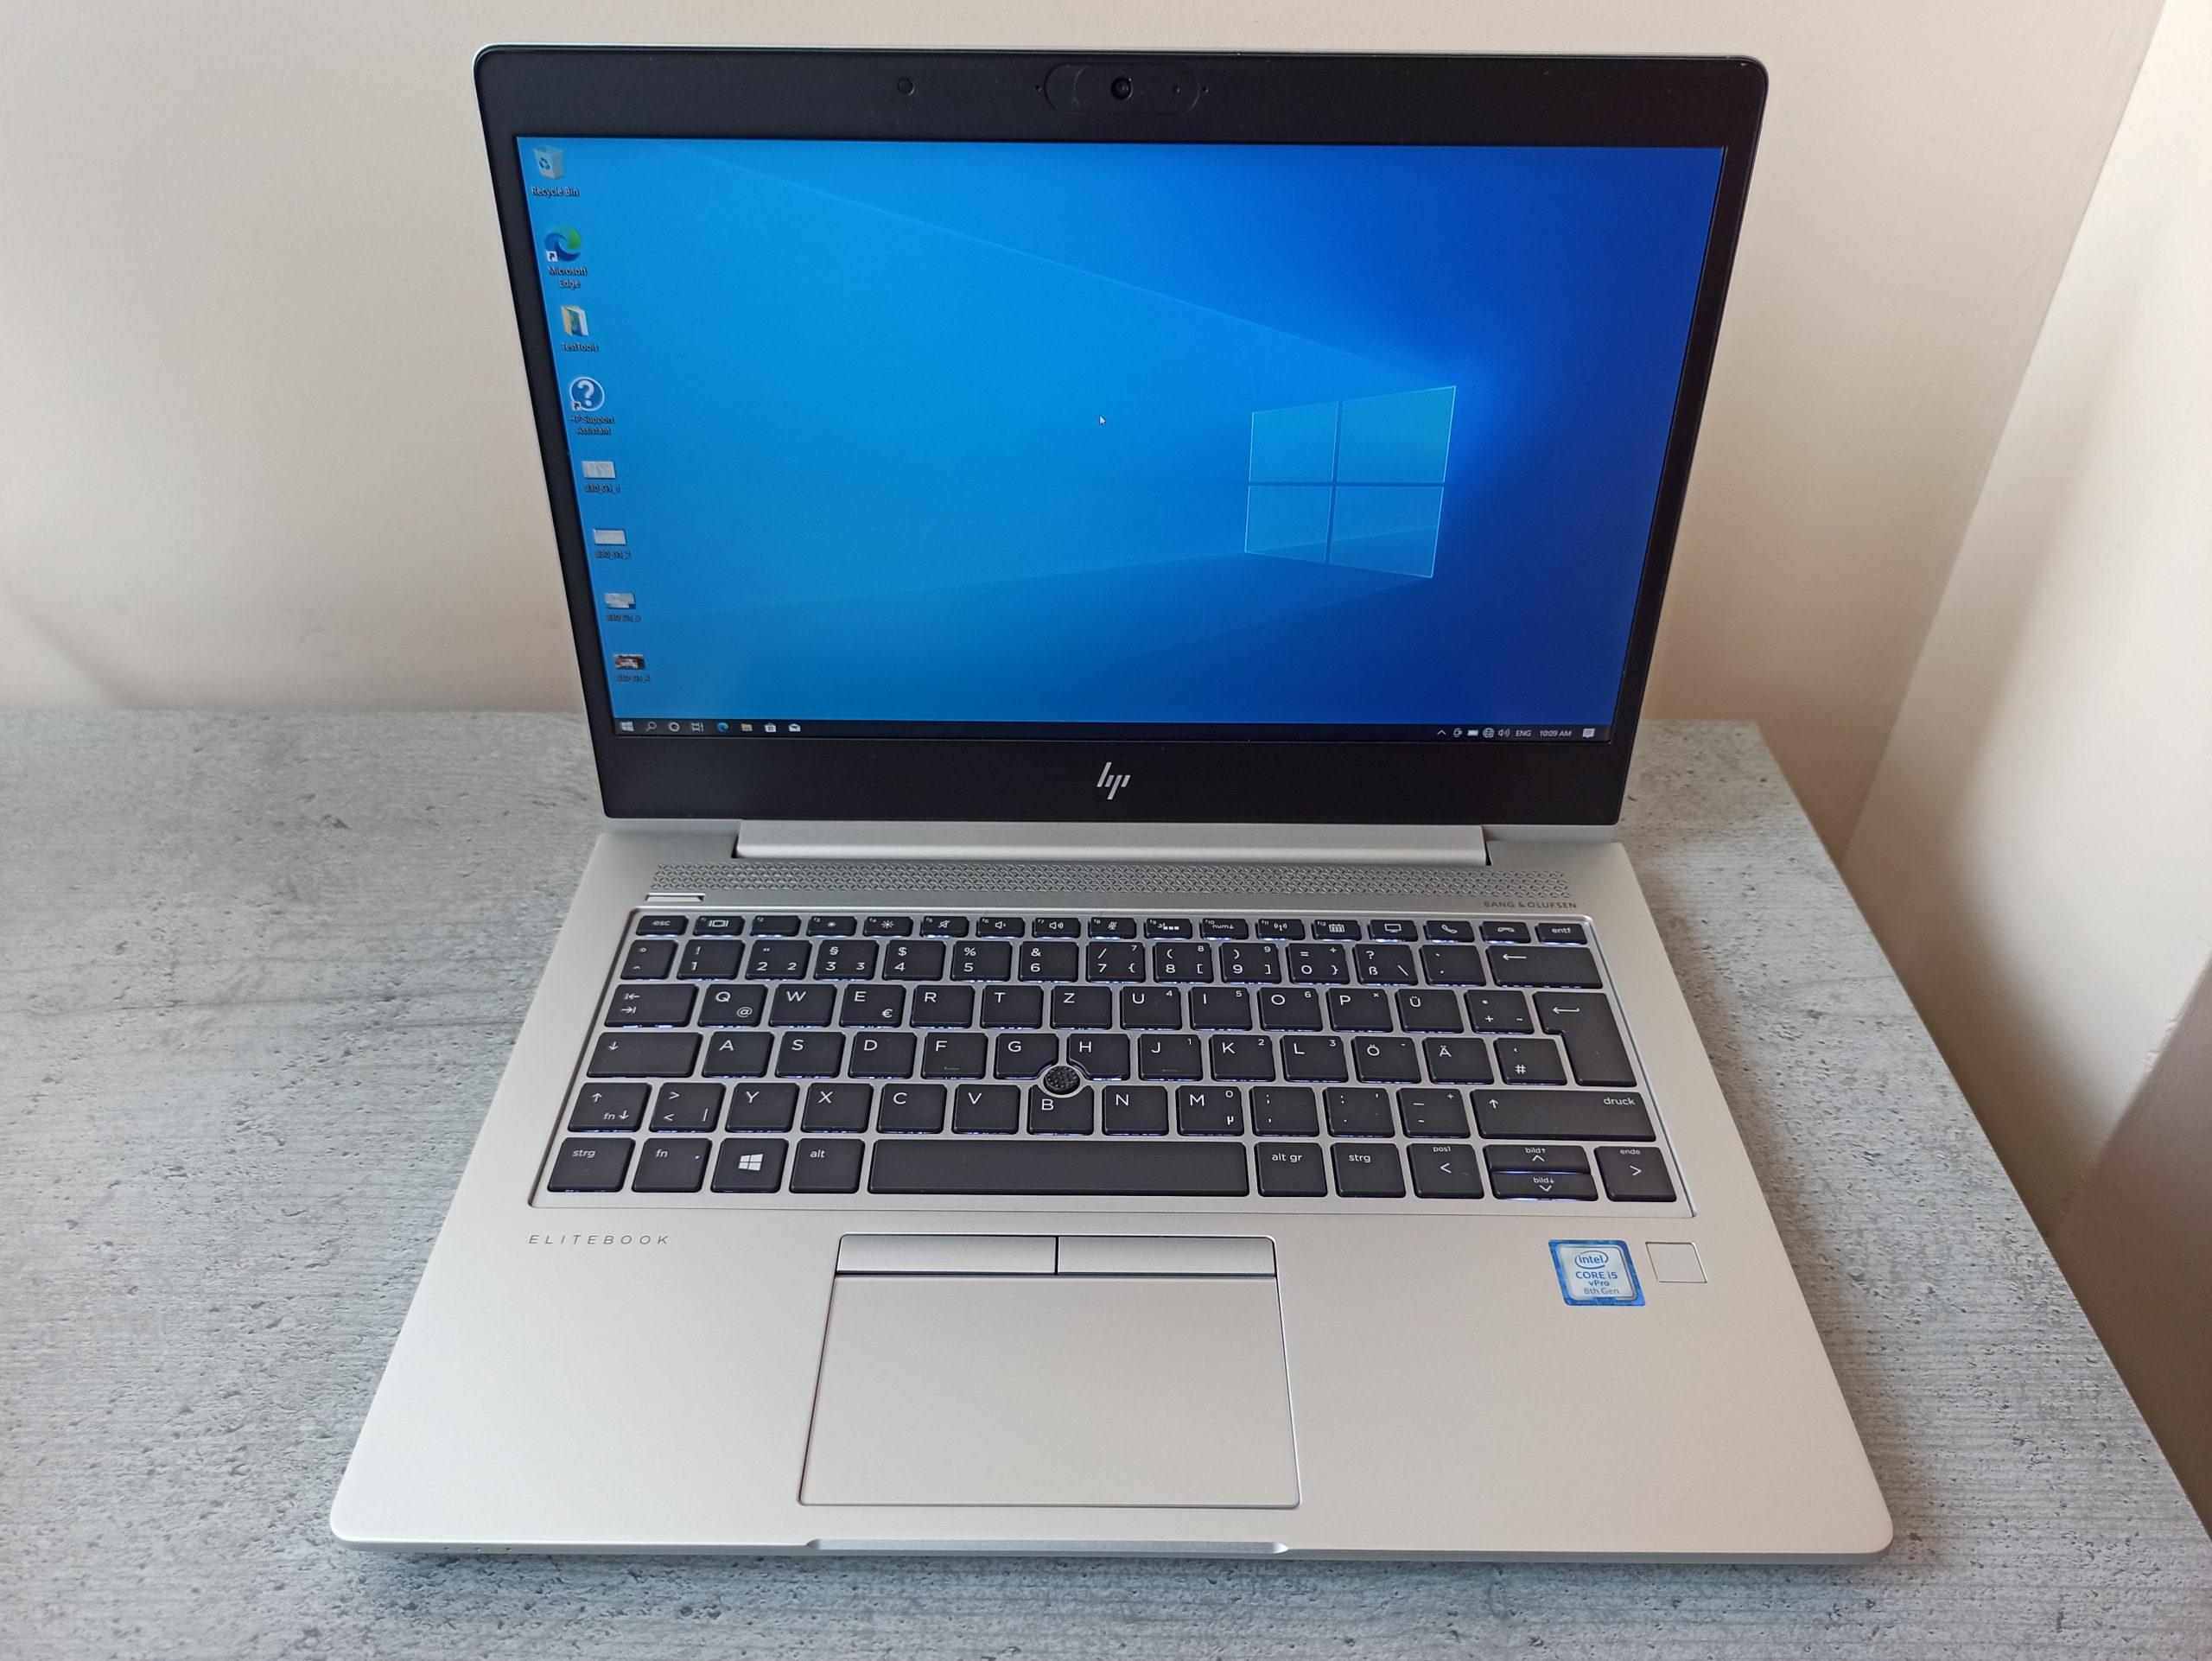 HP Elitebook 830 G5 FHD IPS i5-8350U/256GB/8GB/4G модем - Гаранция 16.05.2022г.